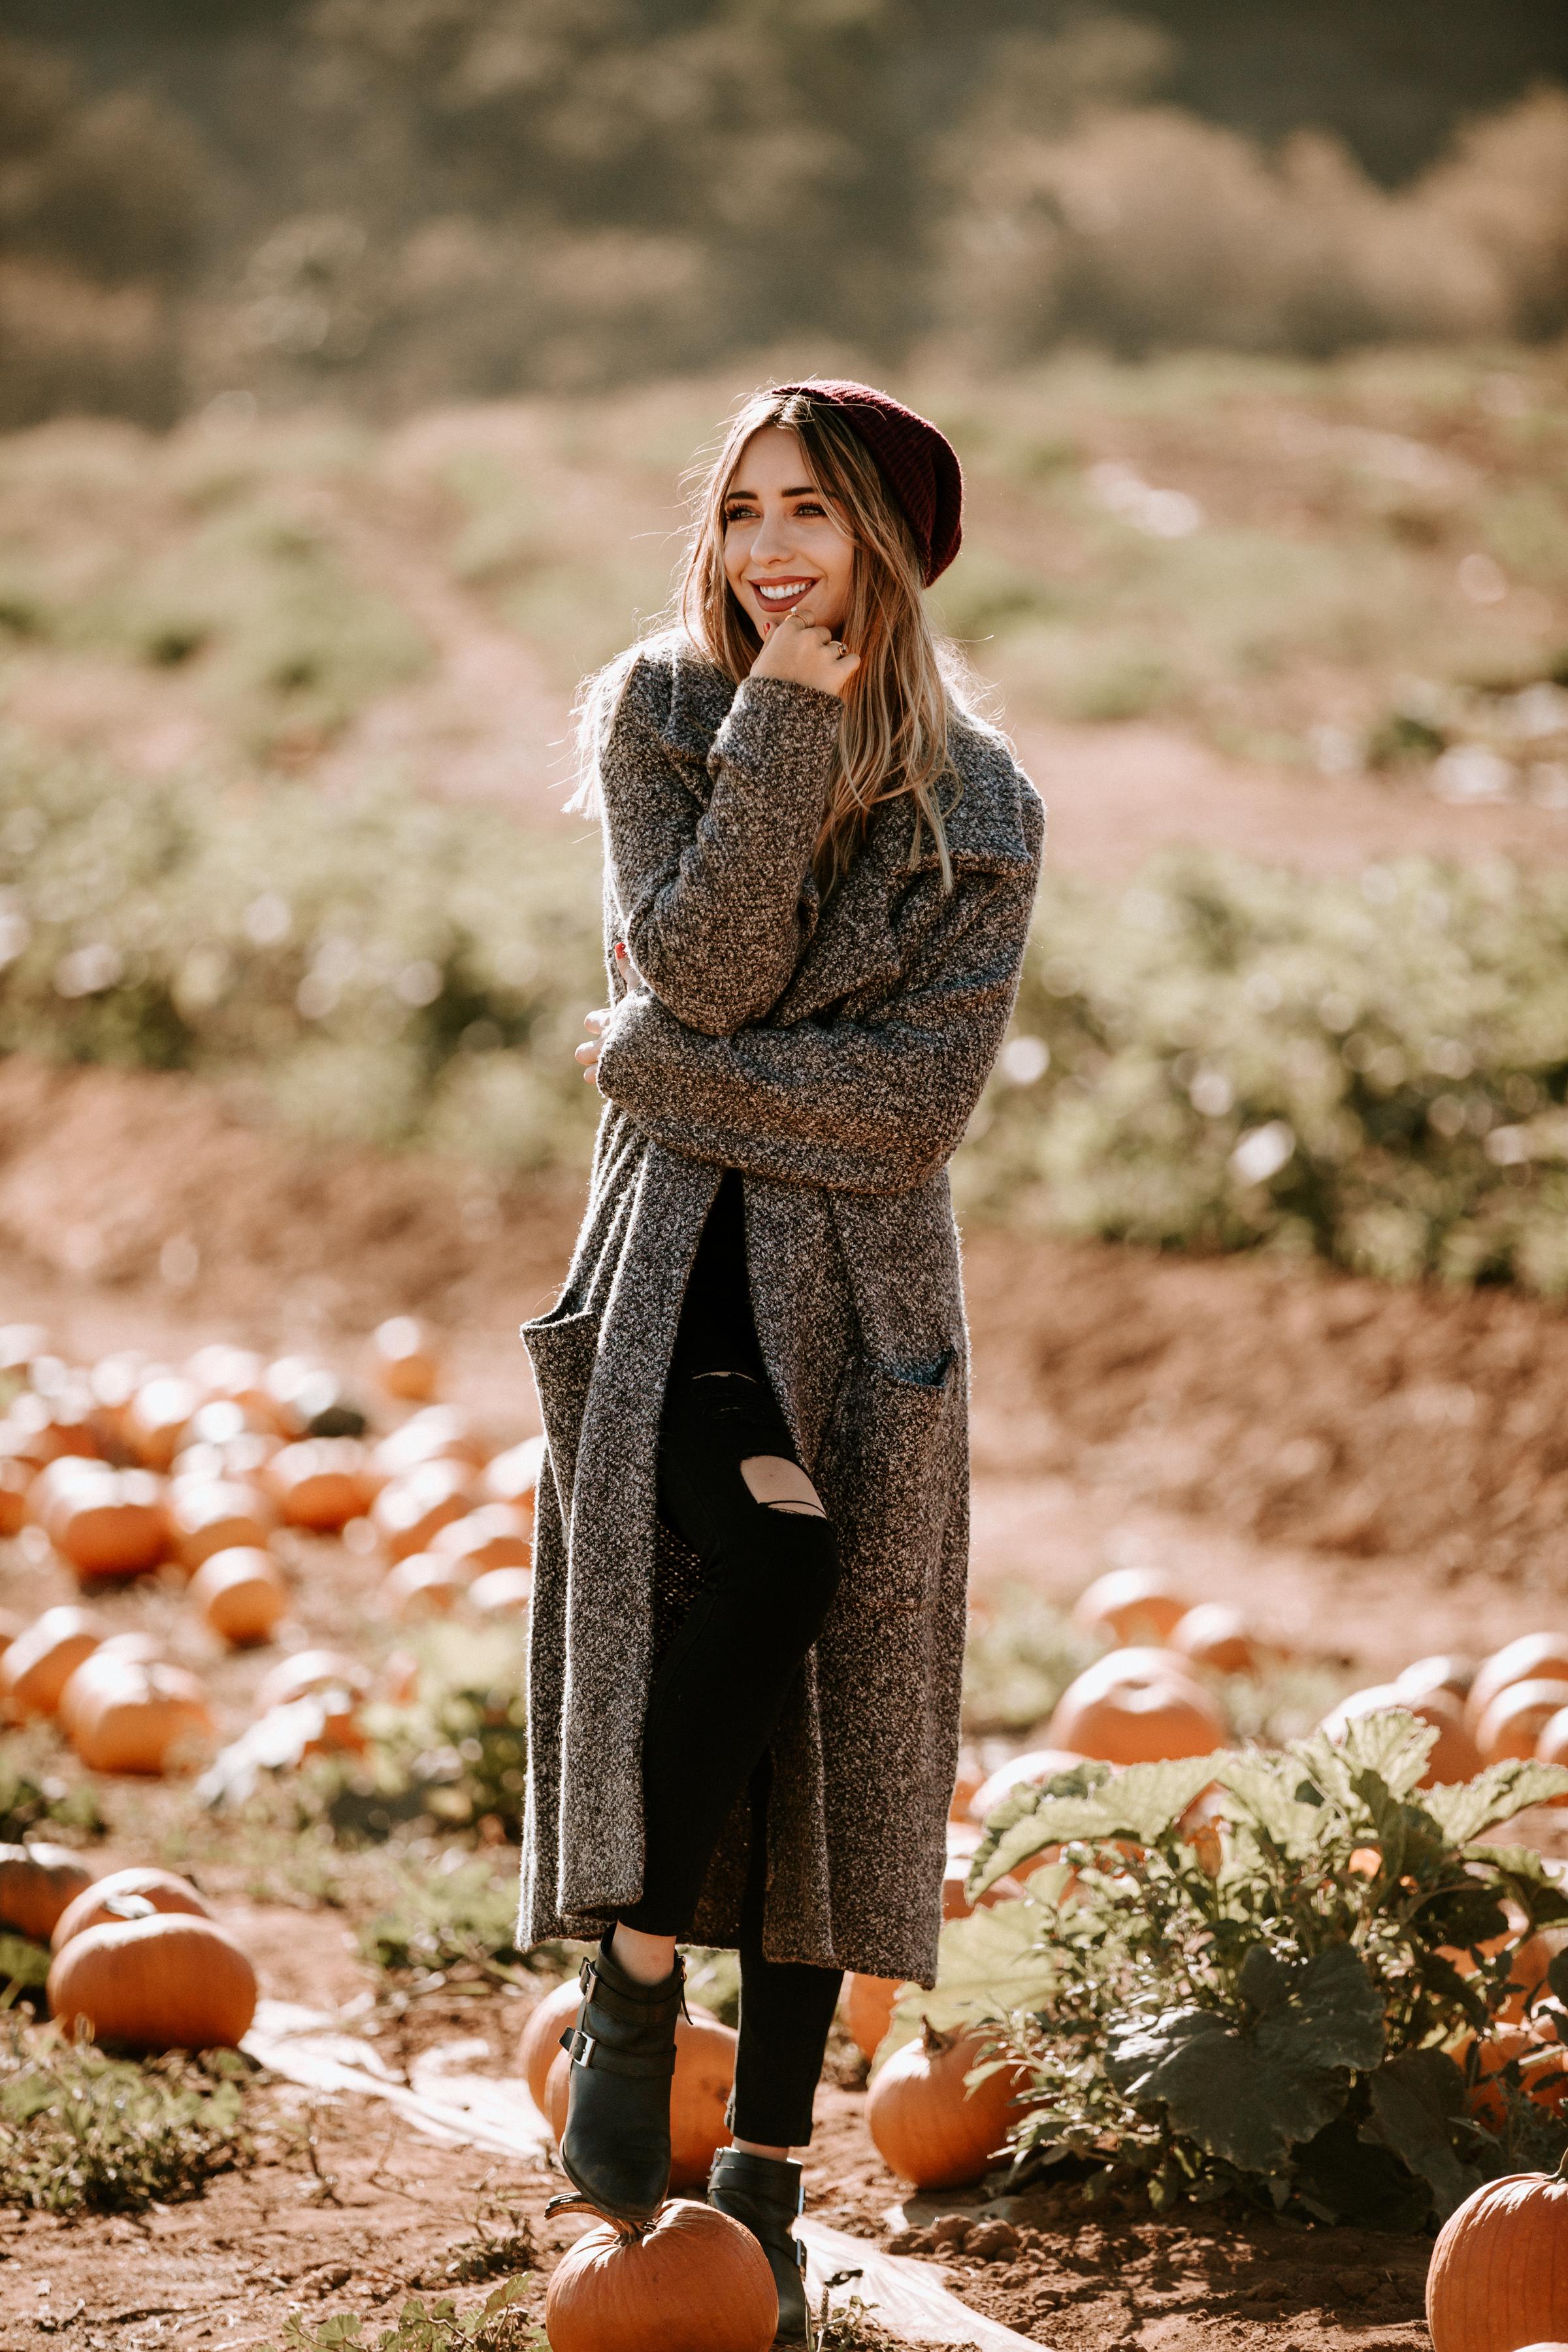 2017-10-16_Lindsey Carlene_Pumpkin Patch_HR-2.jpg